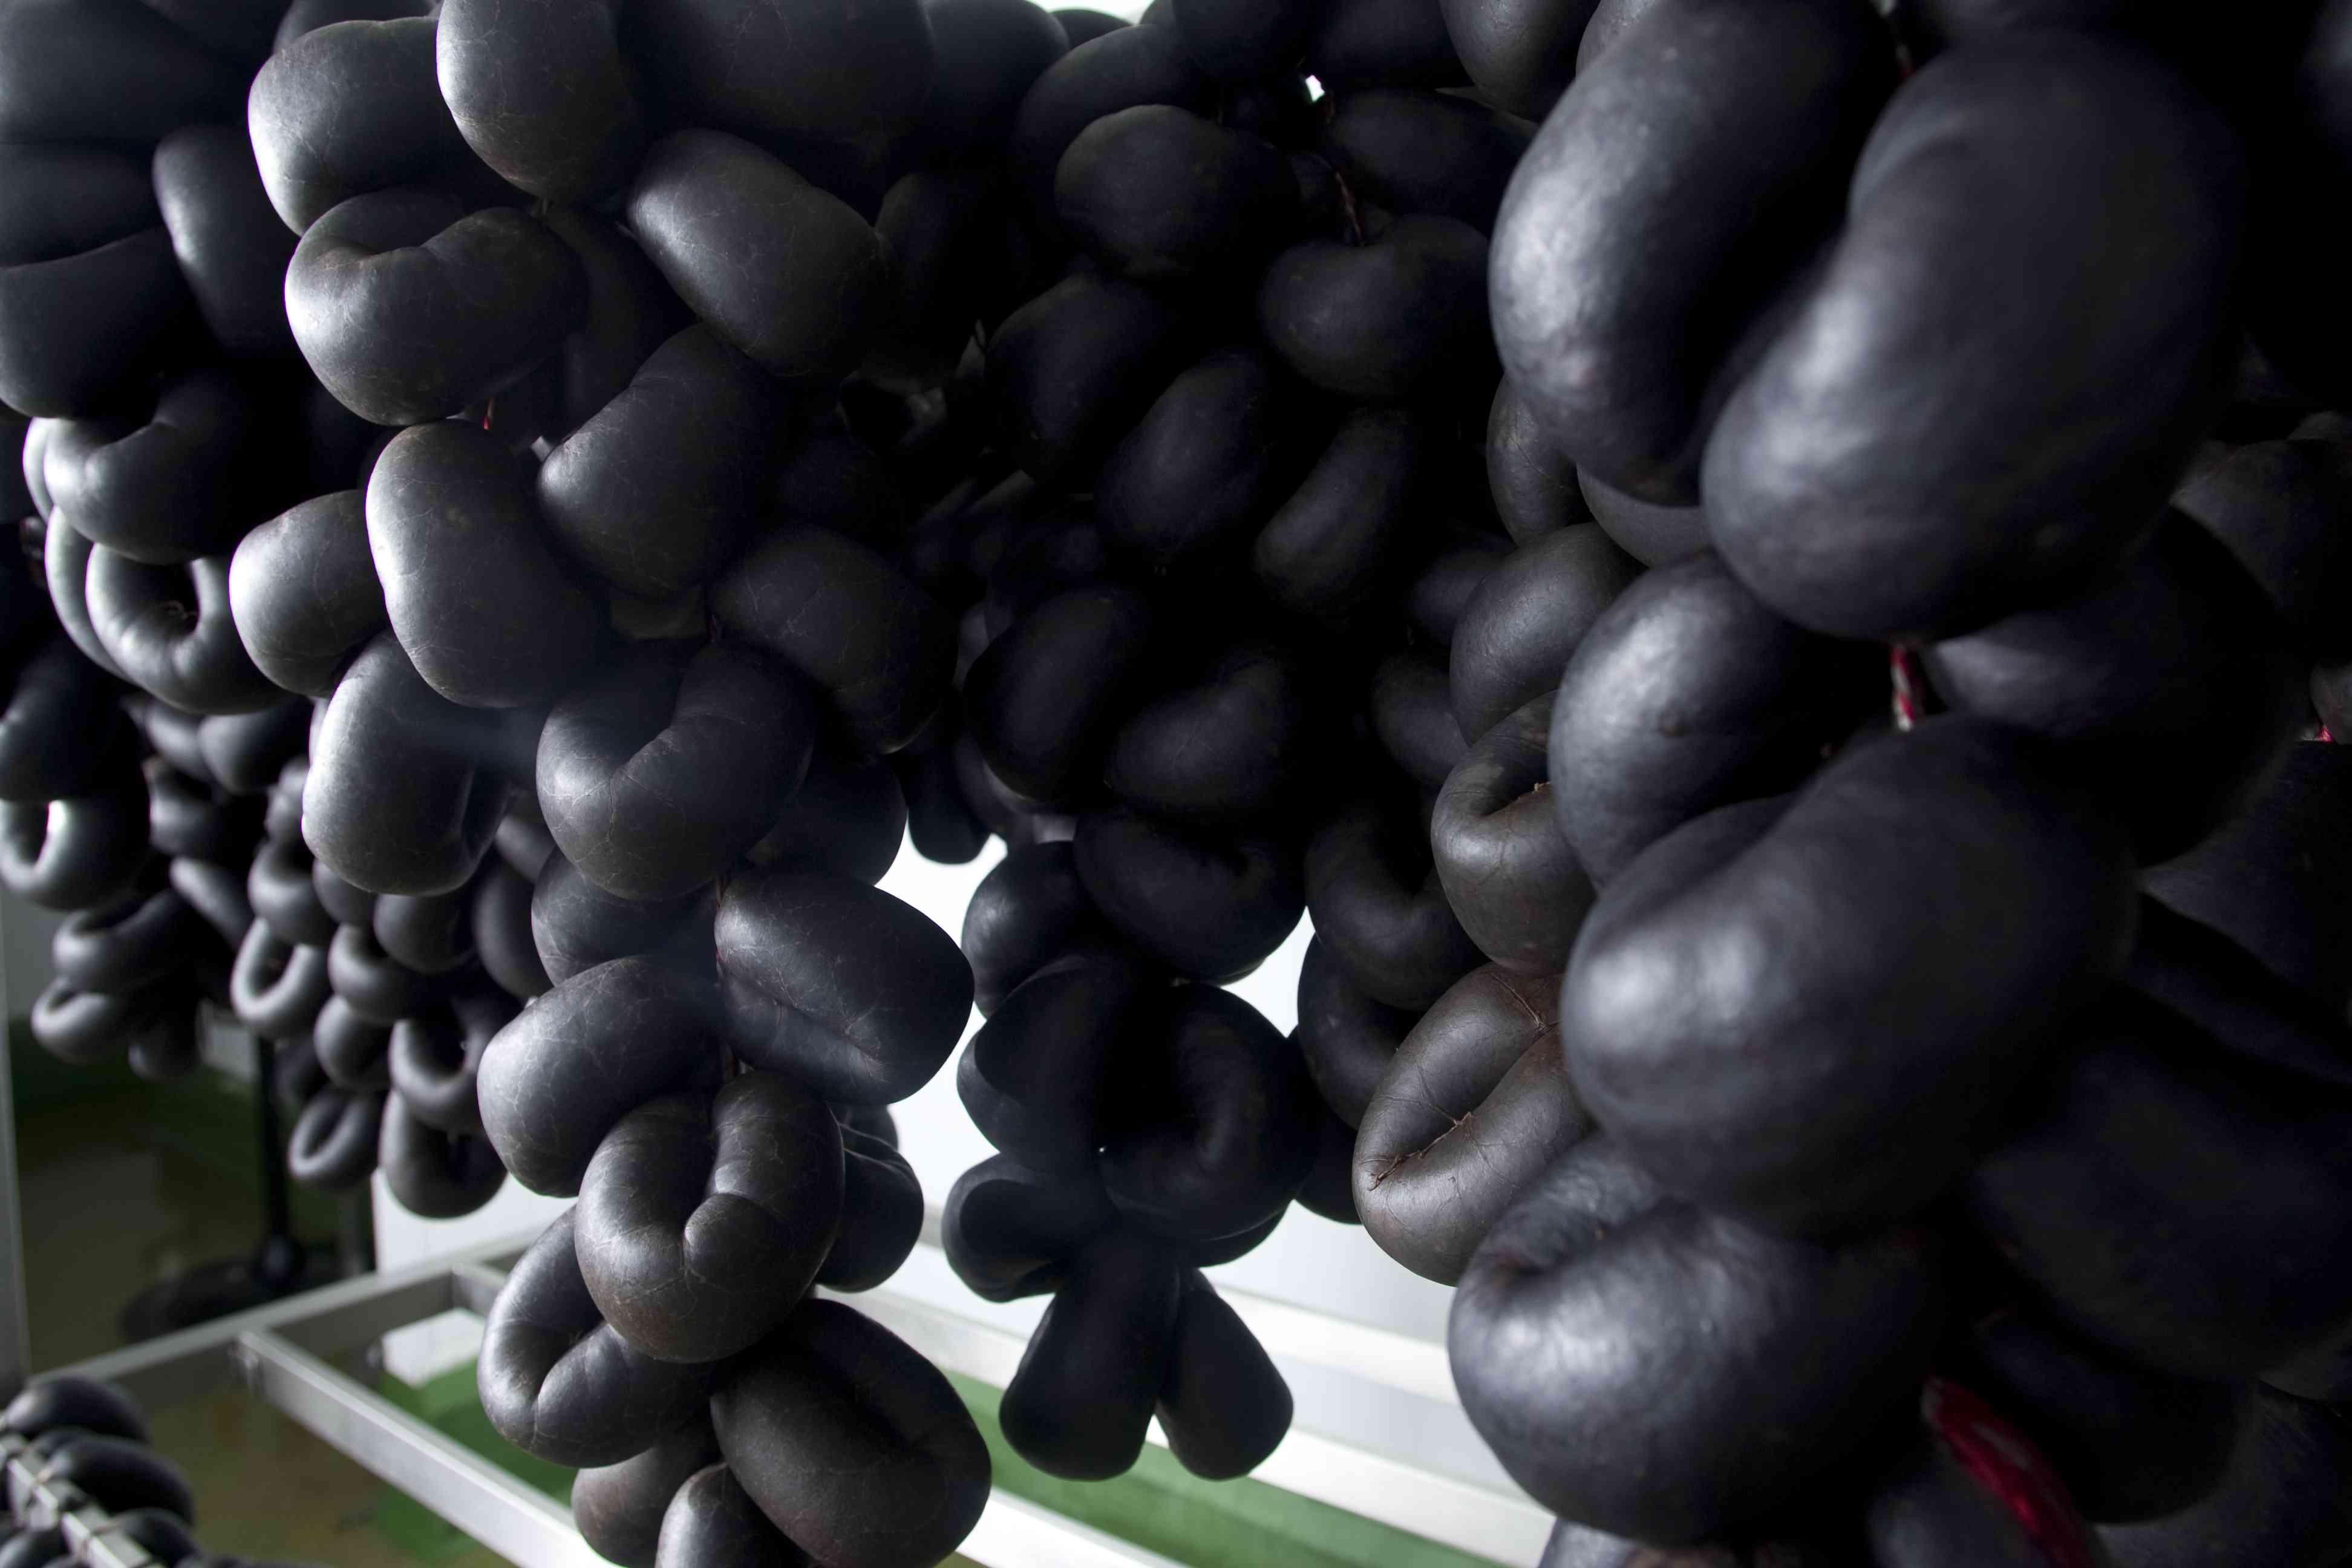 Freshly-made traditional Bury black puddings drying on a rack